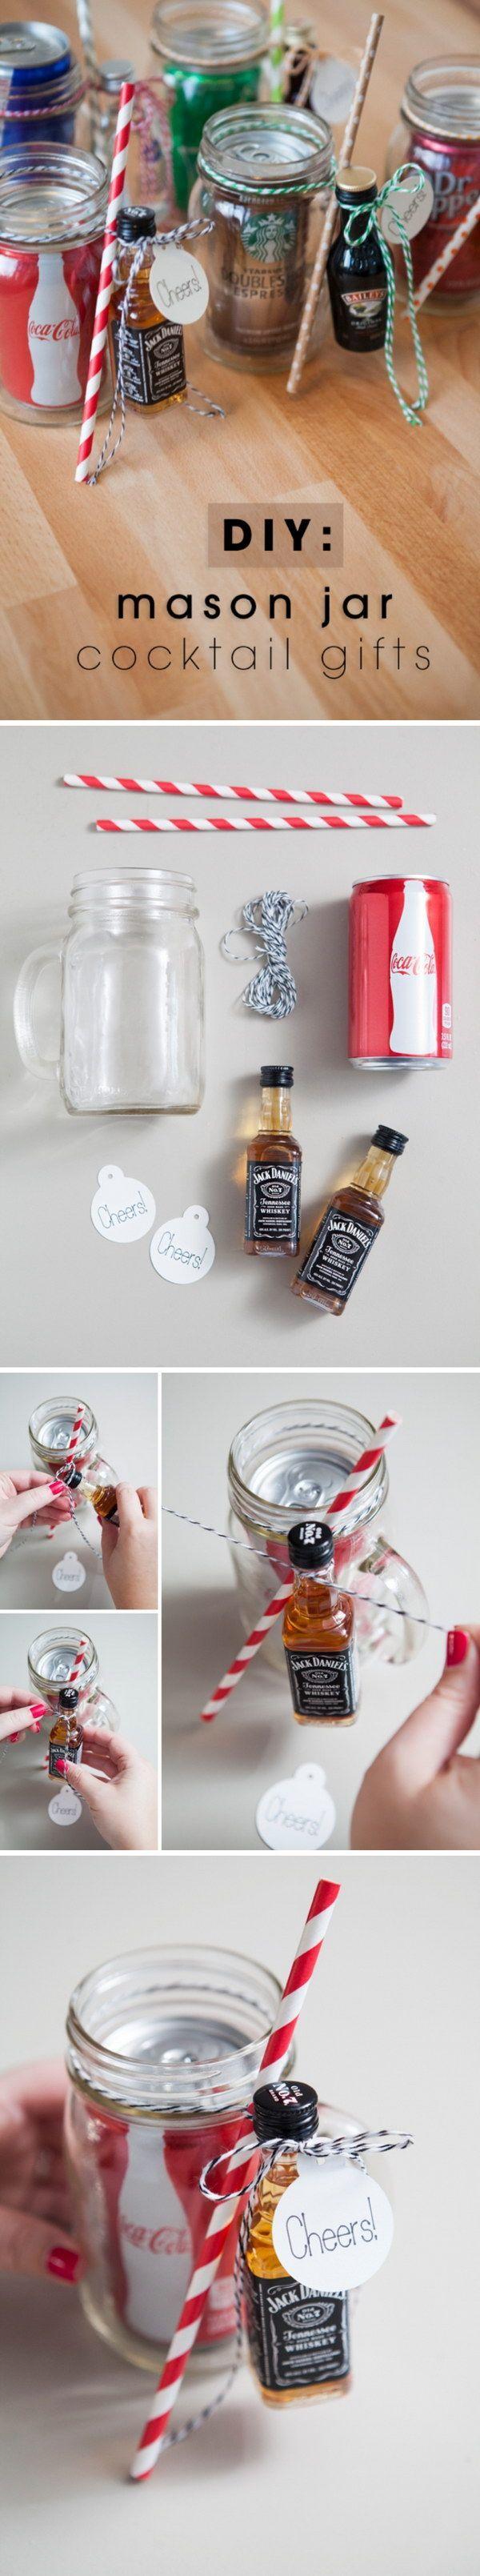 15 Easy Mason Jar Christmas Decorations You Can Make Yourself